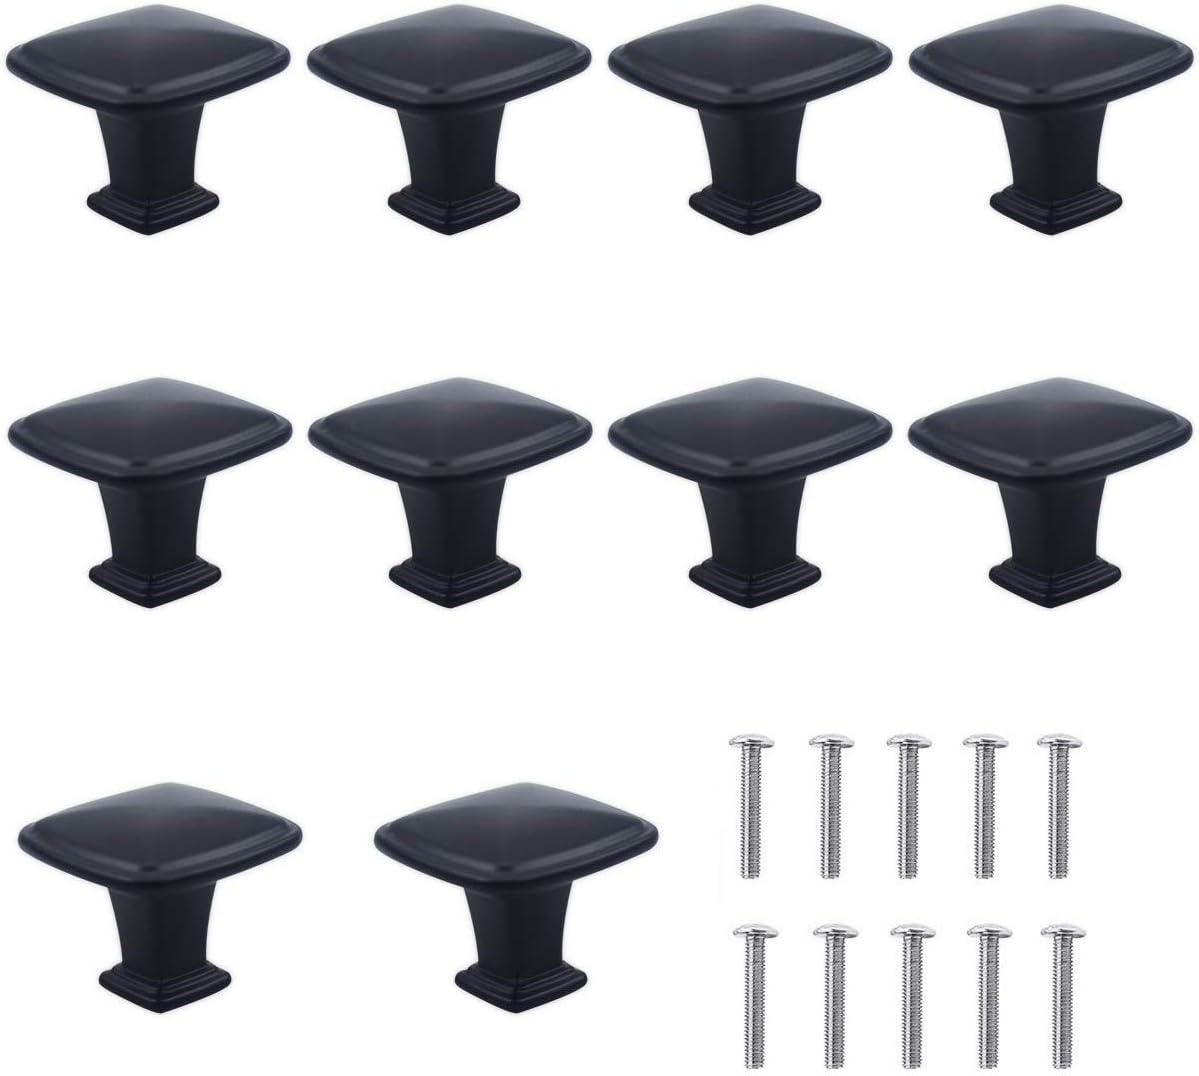 NATUCE 10PCS Negro Pomo de armario redondo, tirador para cajón, Pomos y Tiradores de Muebles, 30mm Pomos, pomos redondos, para Puertas, Armarios de Cocina,Cajones - un solo agujero (B)